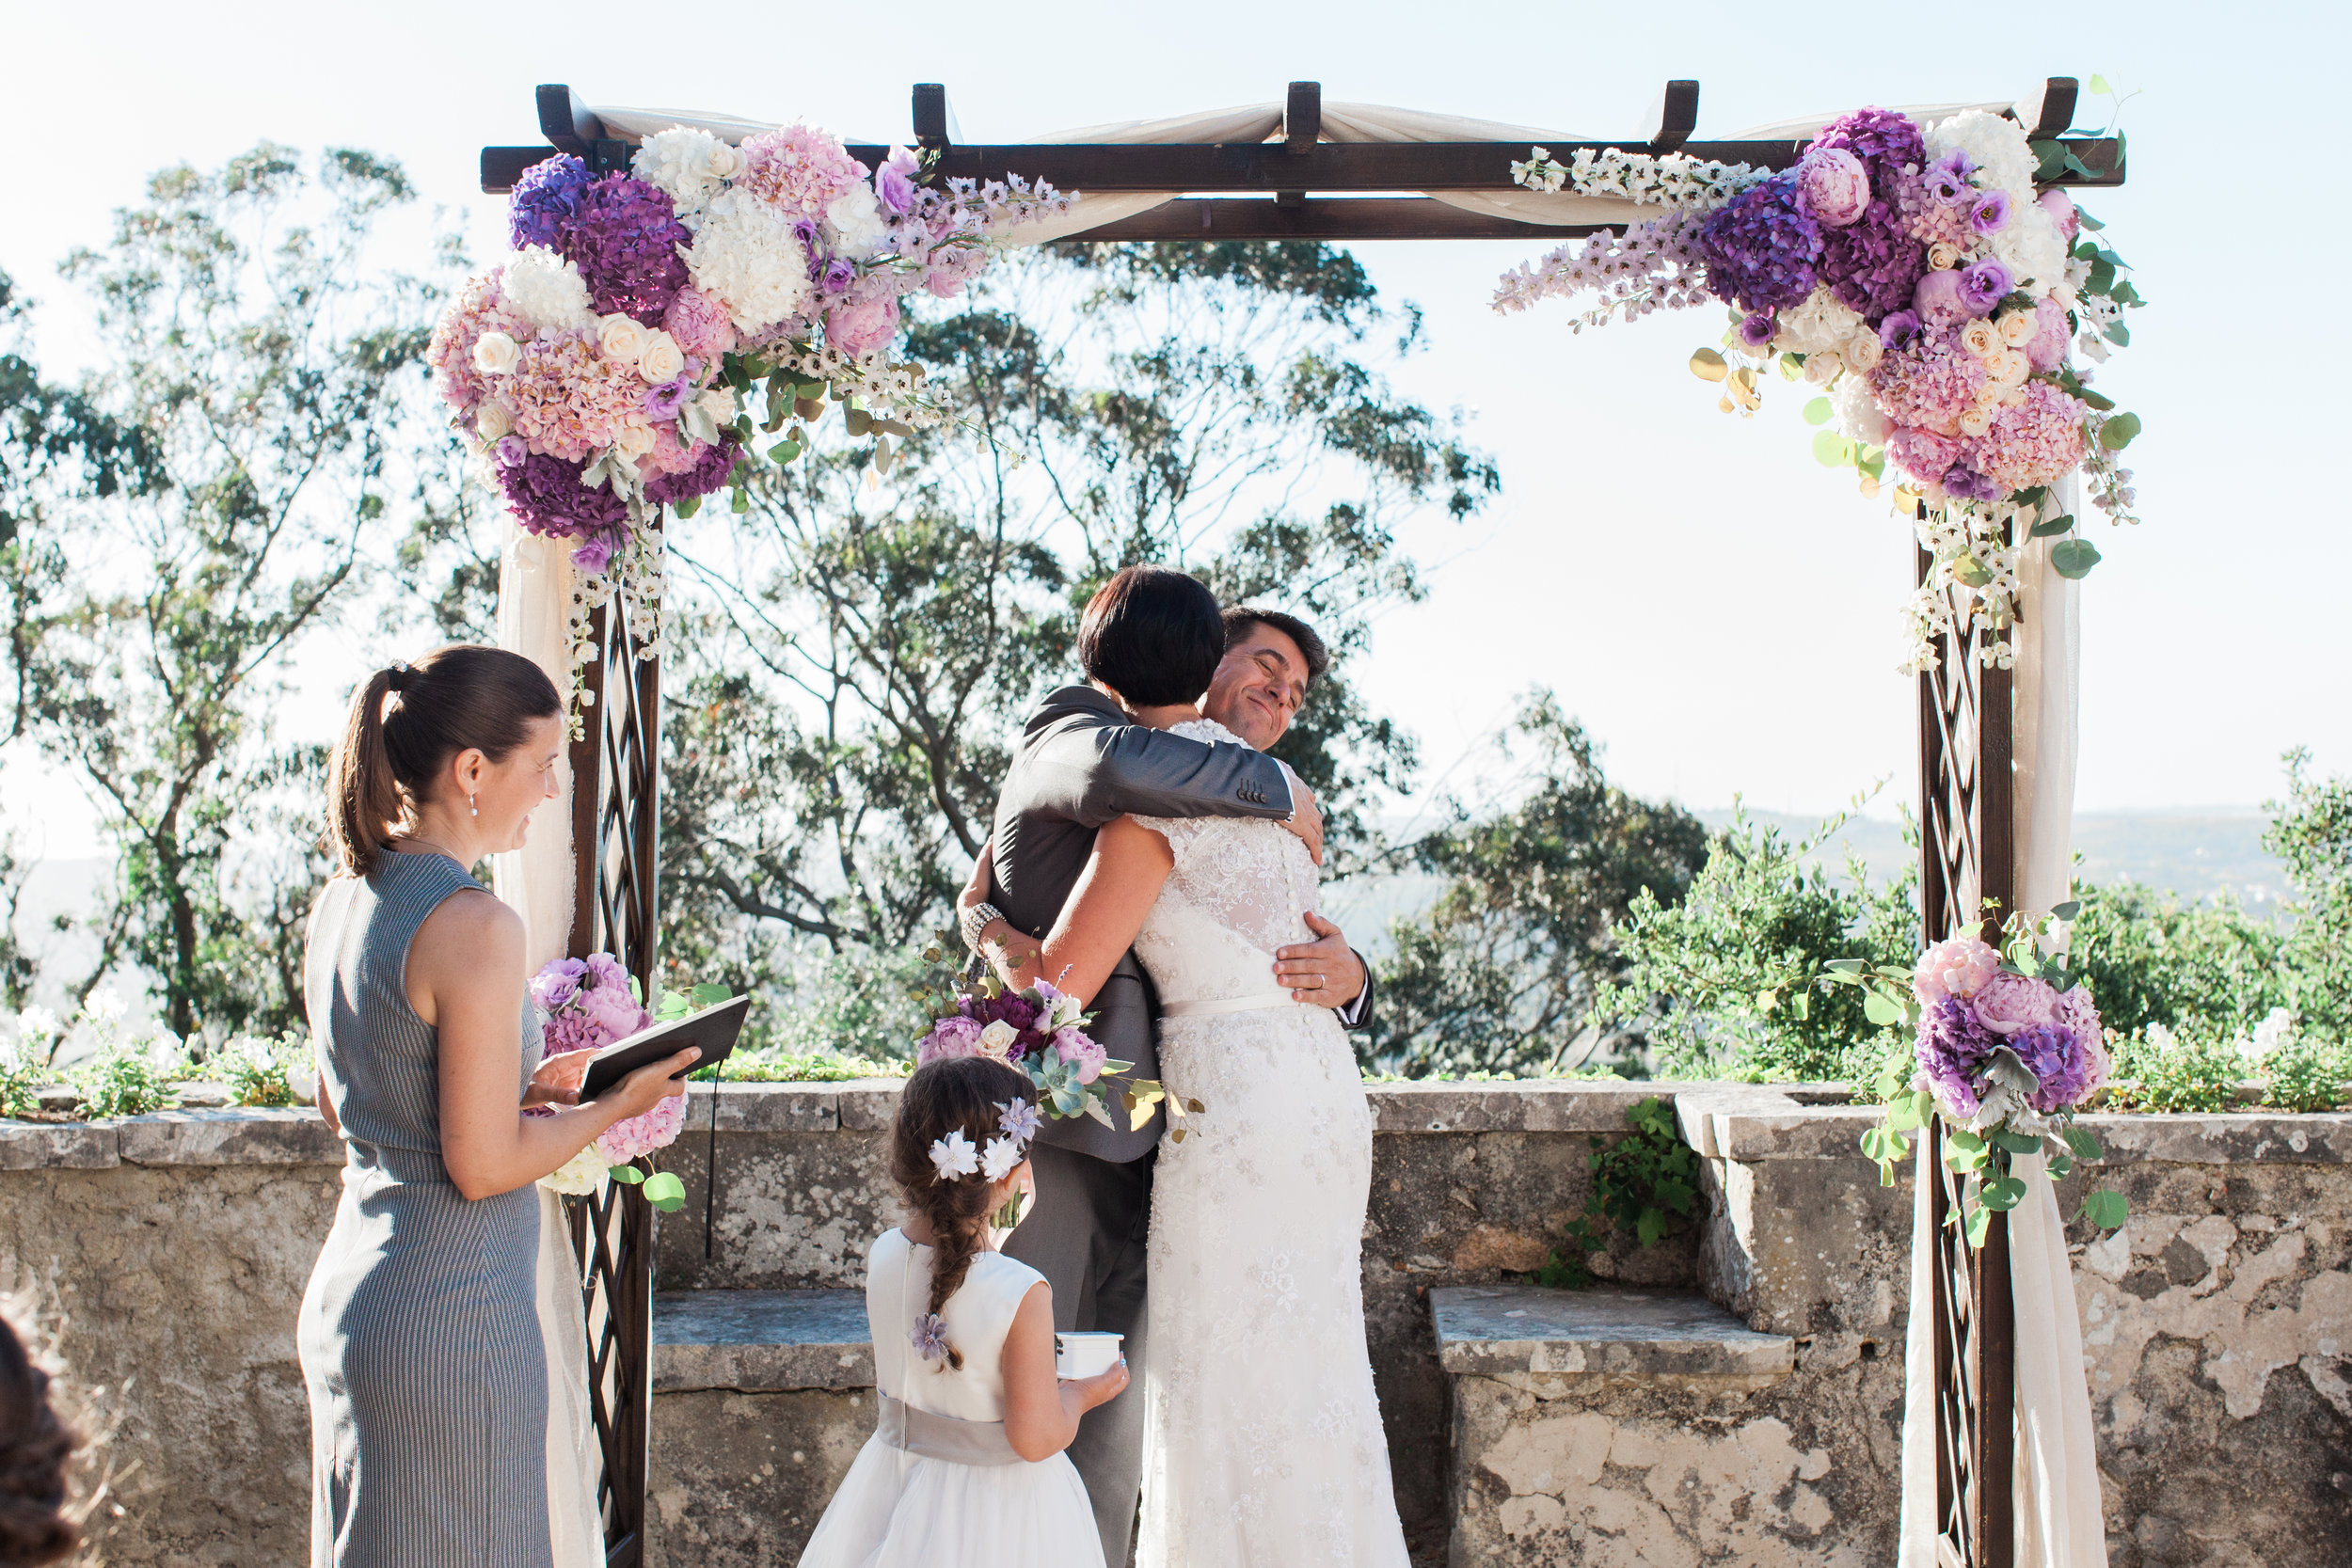 25 mariarao-wedding-palacio-seteais-149.jpg